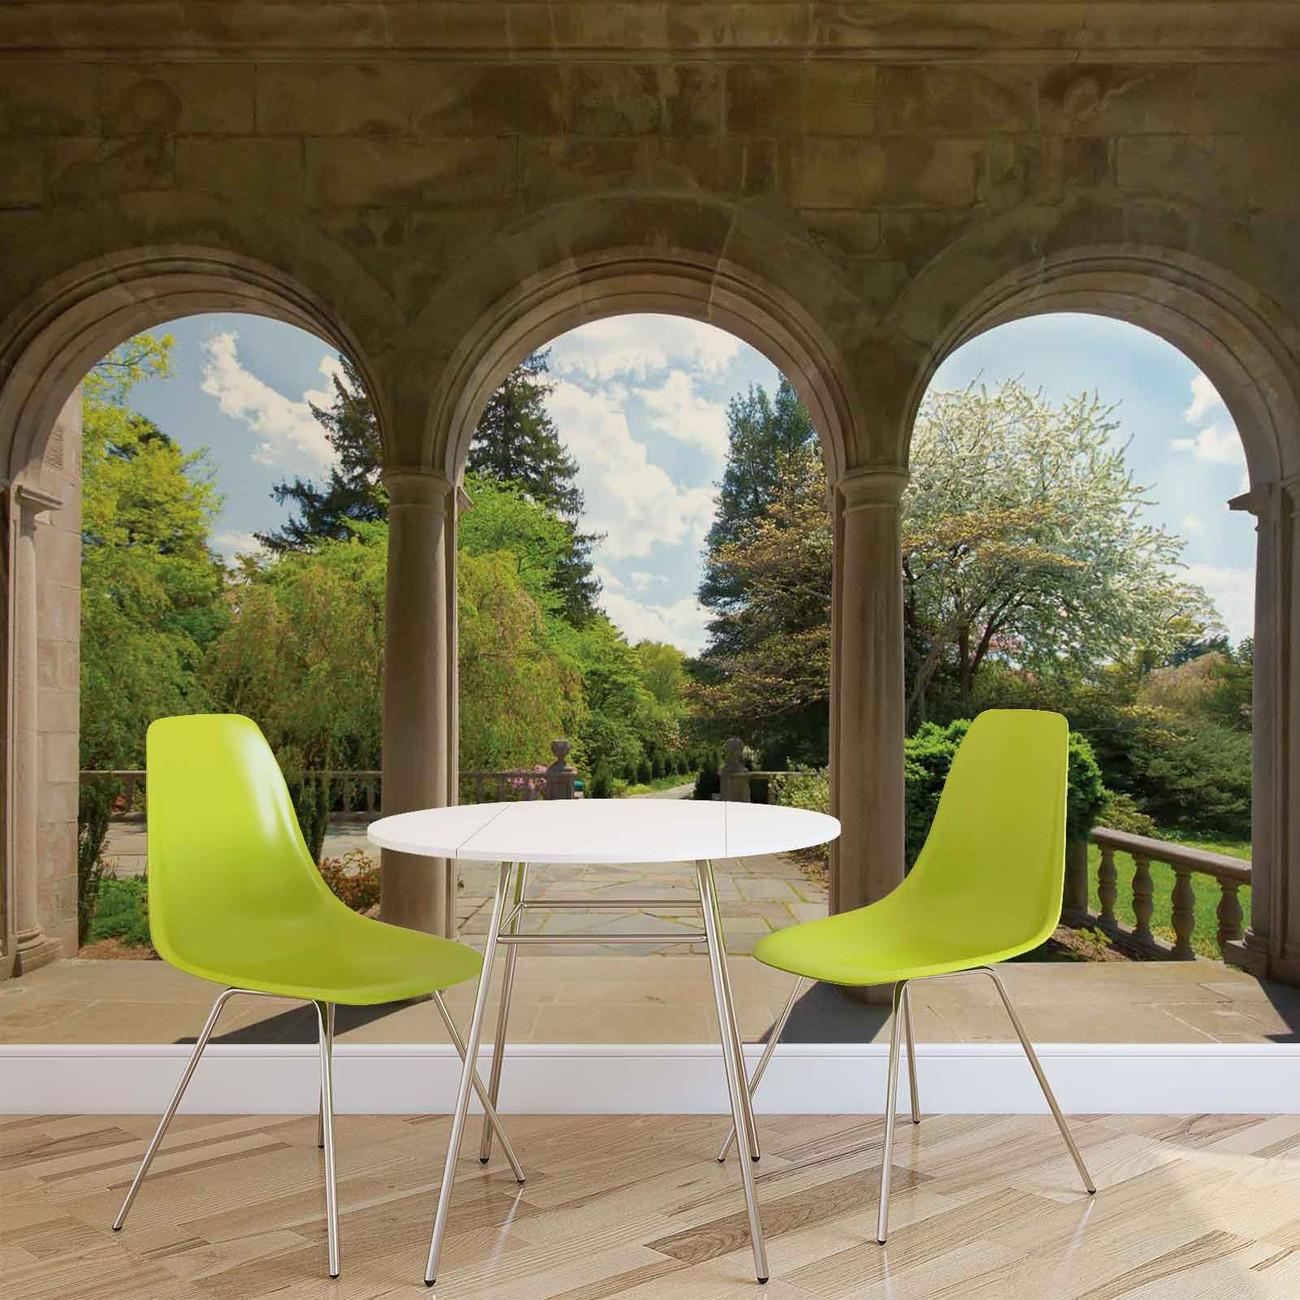 Fotomurale jardin a traves de arcos papel pintado - Arcos de jardin ...